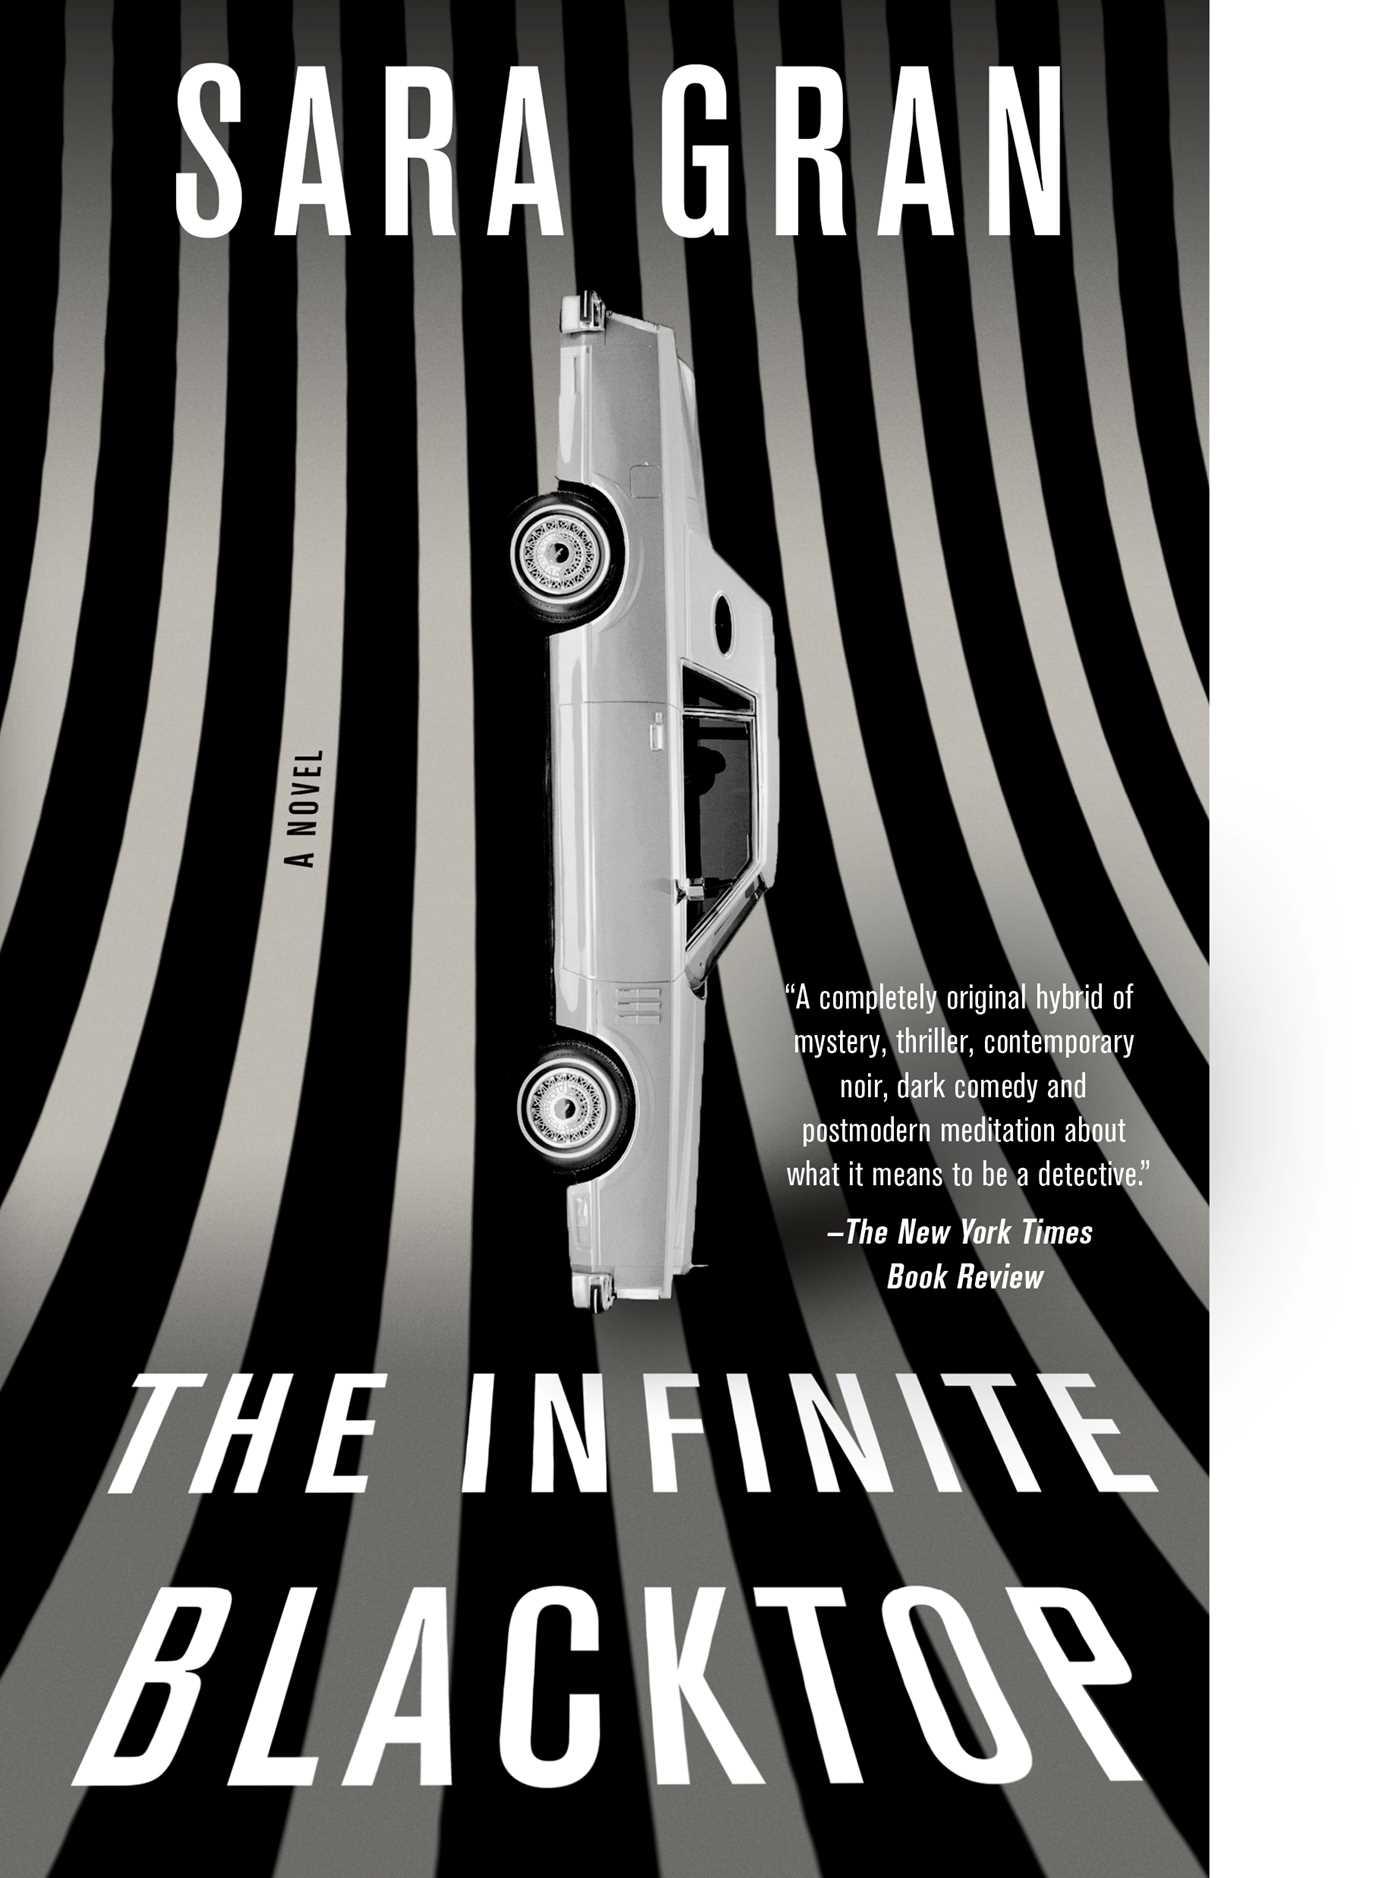 The infinite blacktop 9781501165733 hr